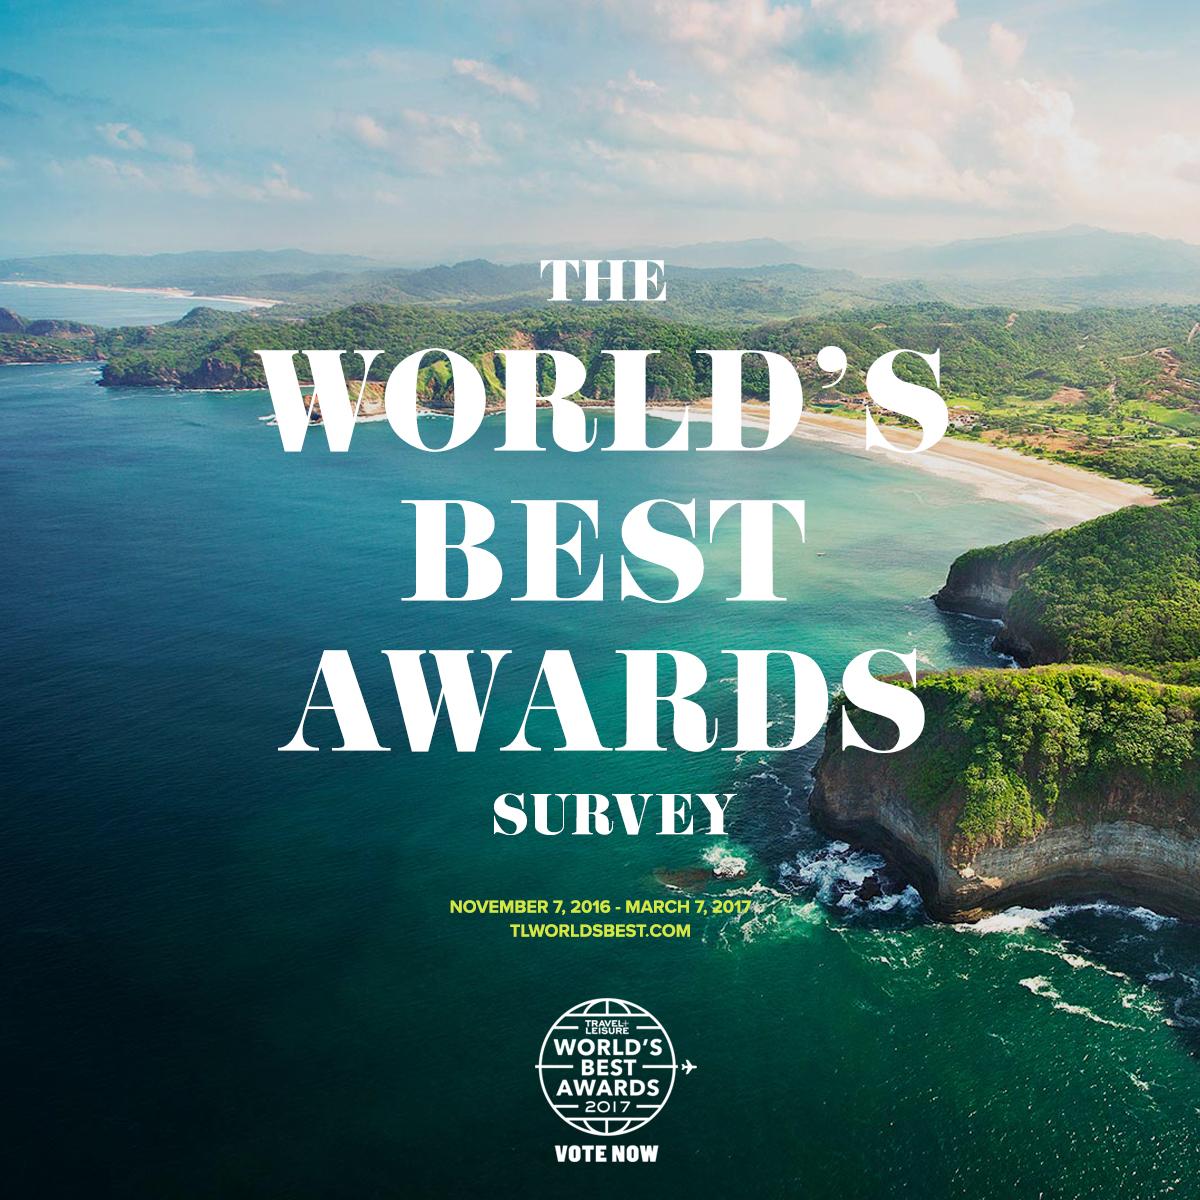 Travel & Leisure Award 2017